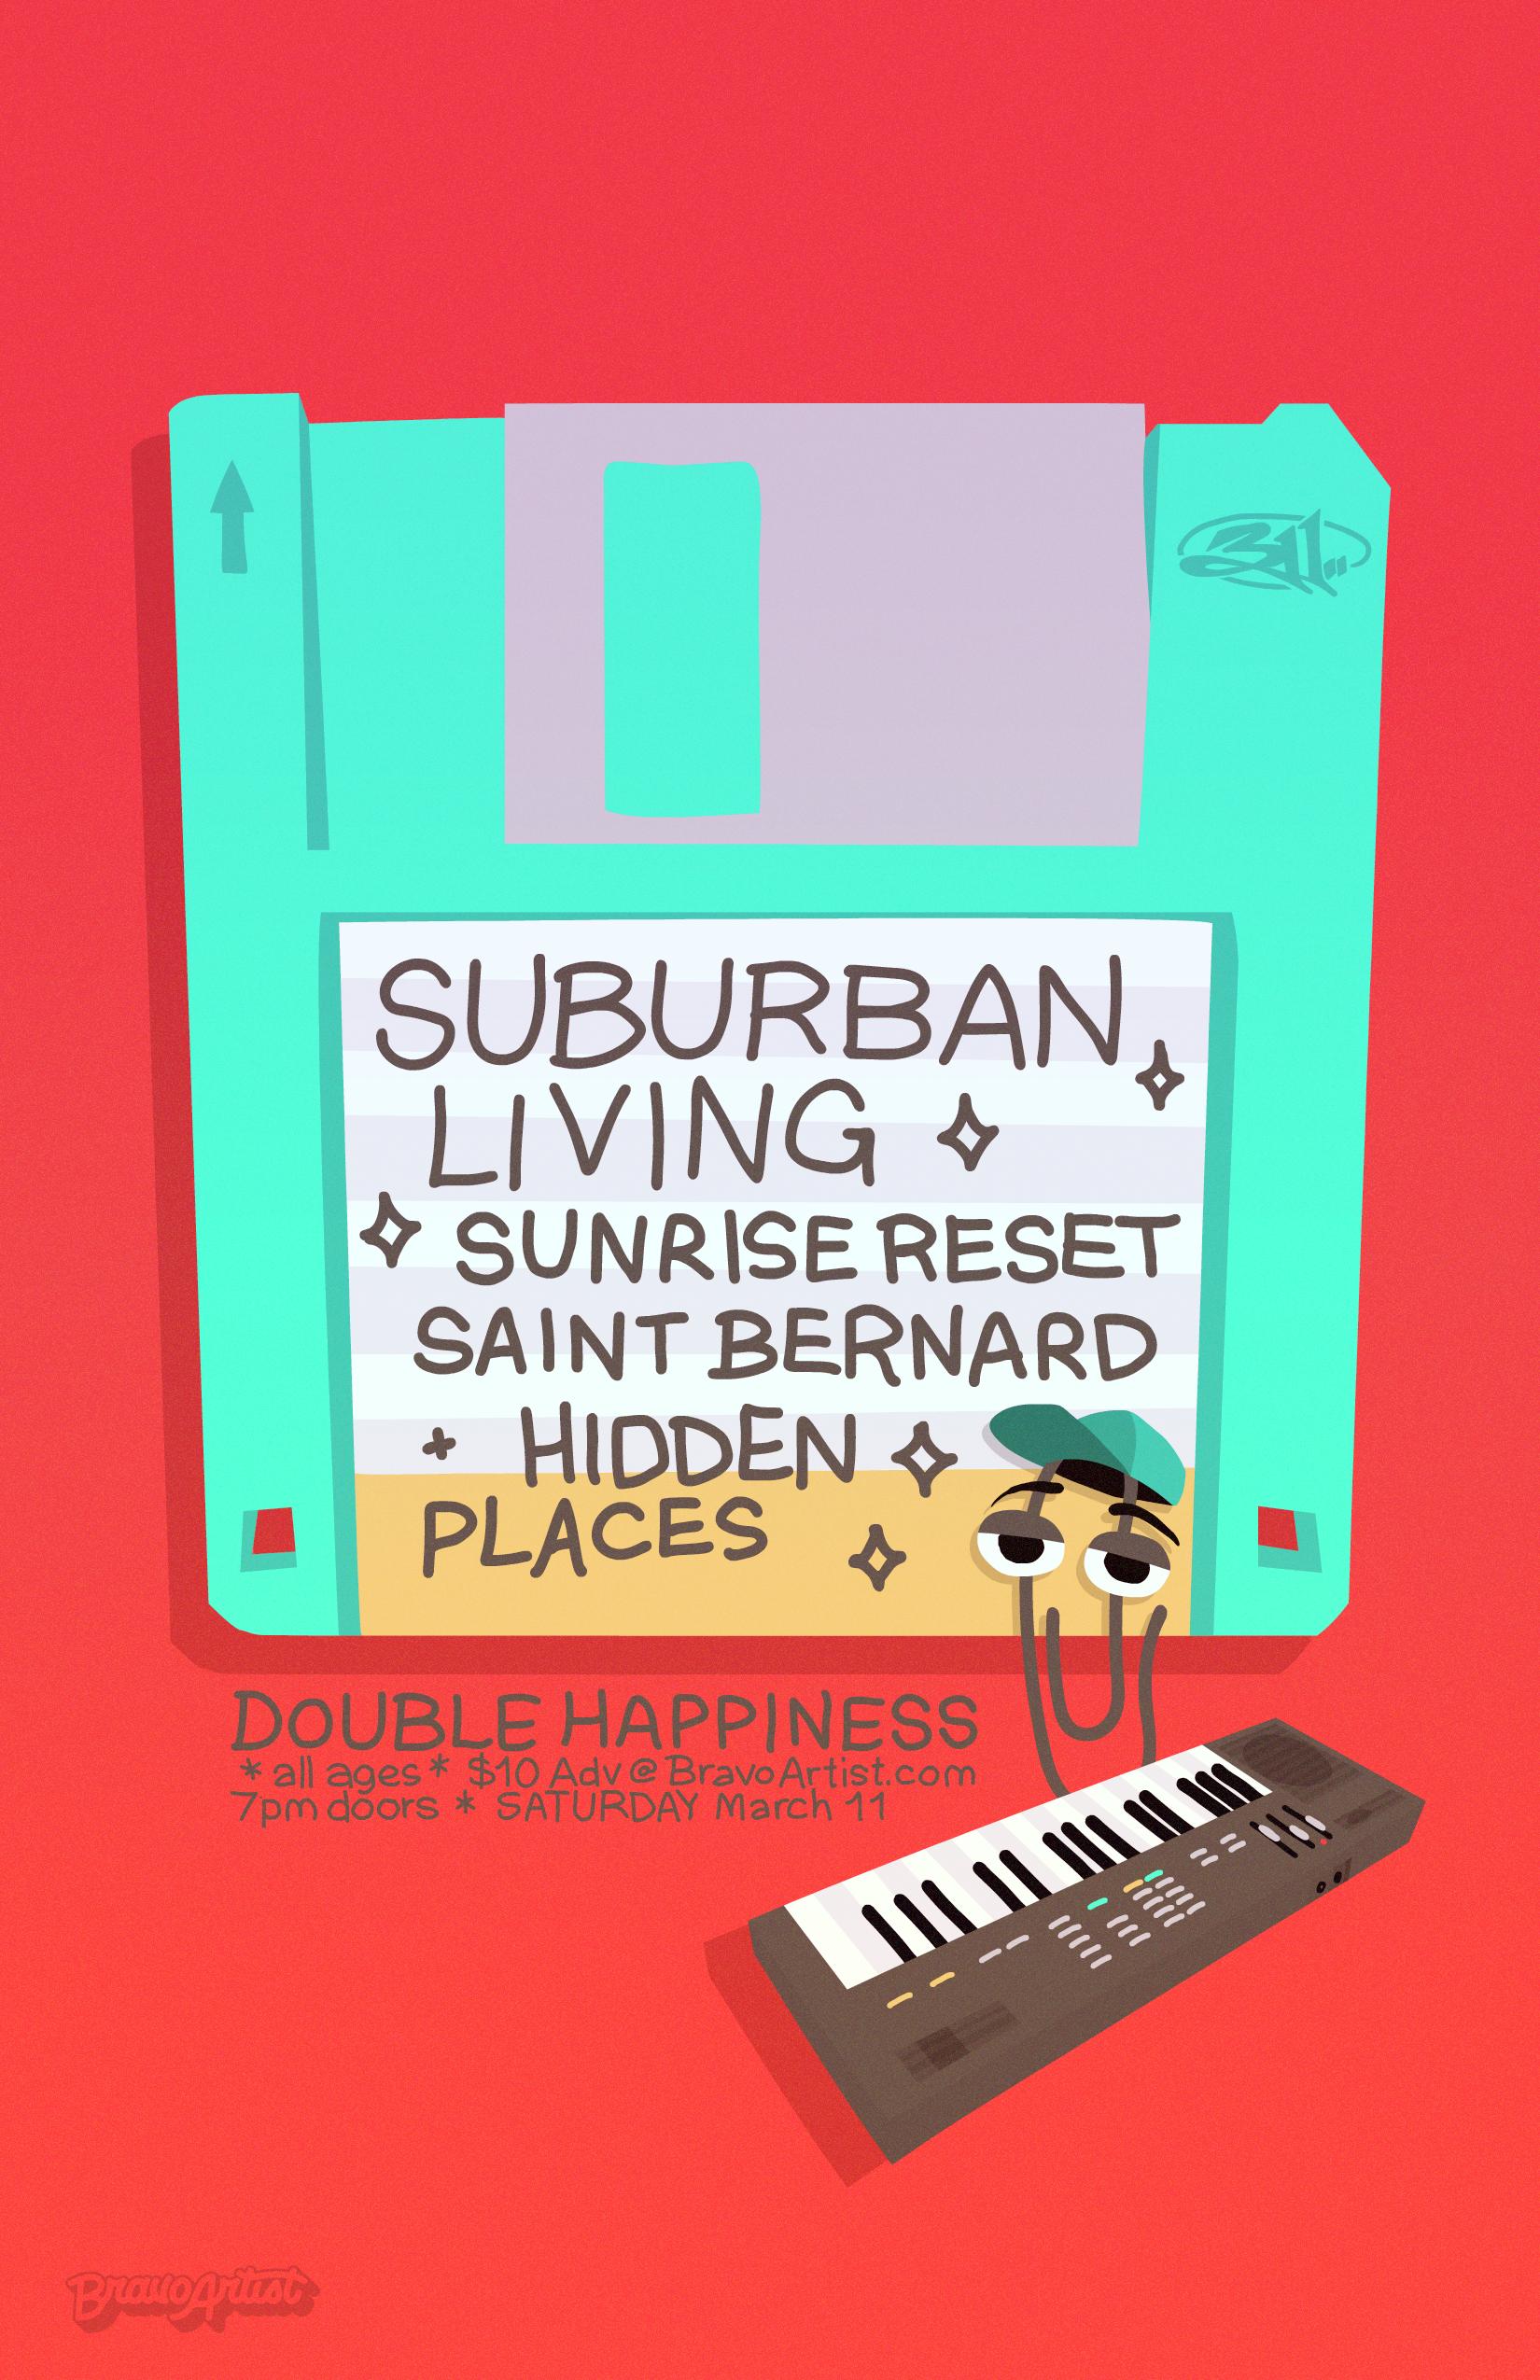 SuburbanLiving_web_v2.png